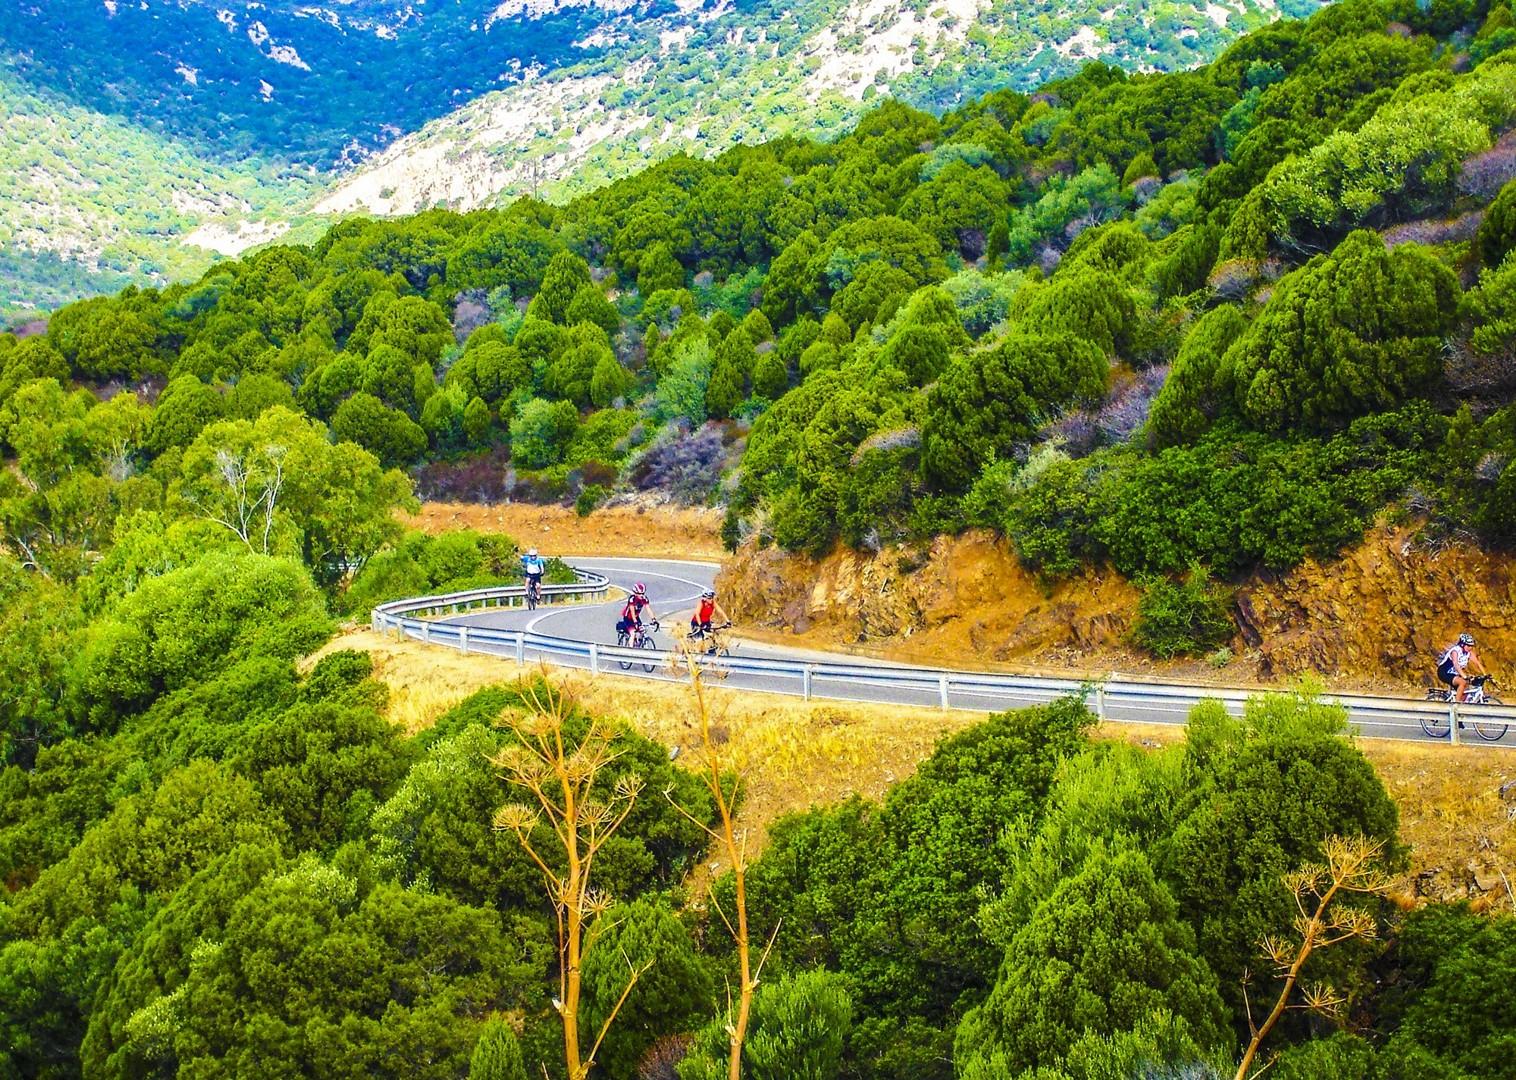 fdfsdfsdfsdfsdfsdf3.jpg - Italy - Sardinia - Island Flavours - Italia Leisure and Family Cycling